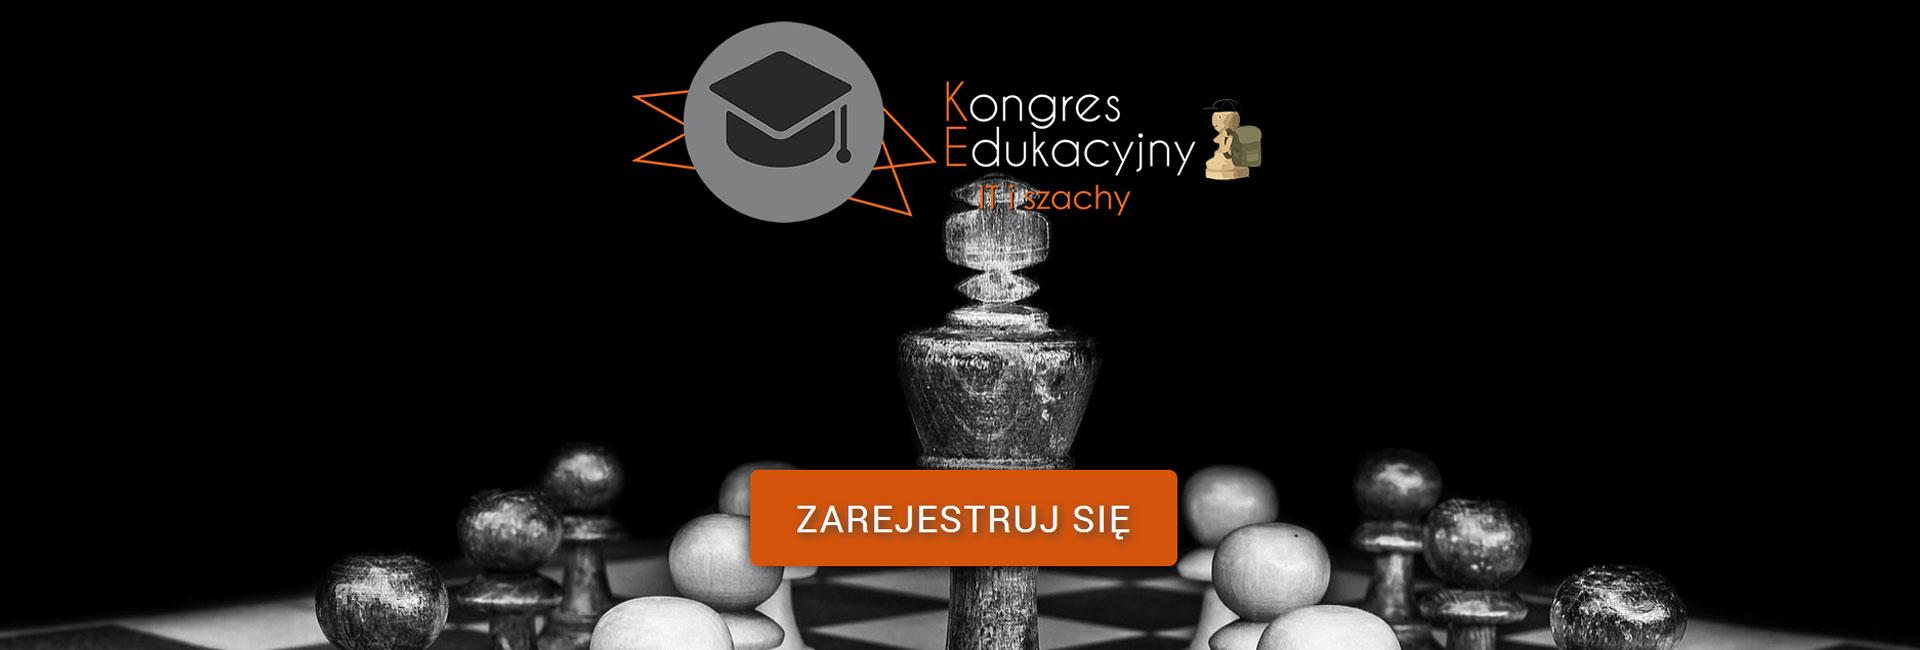 kongres-edukacyjny-banner